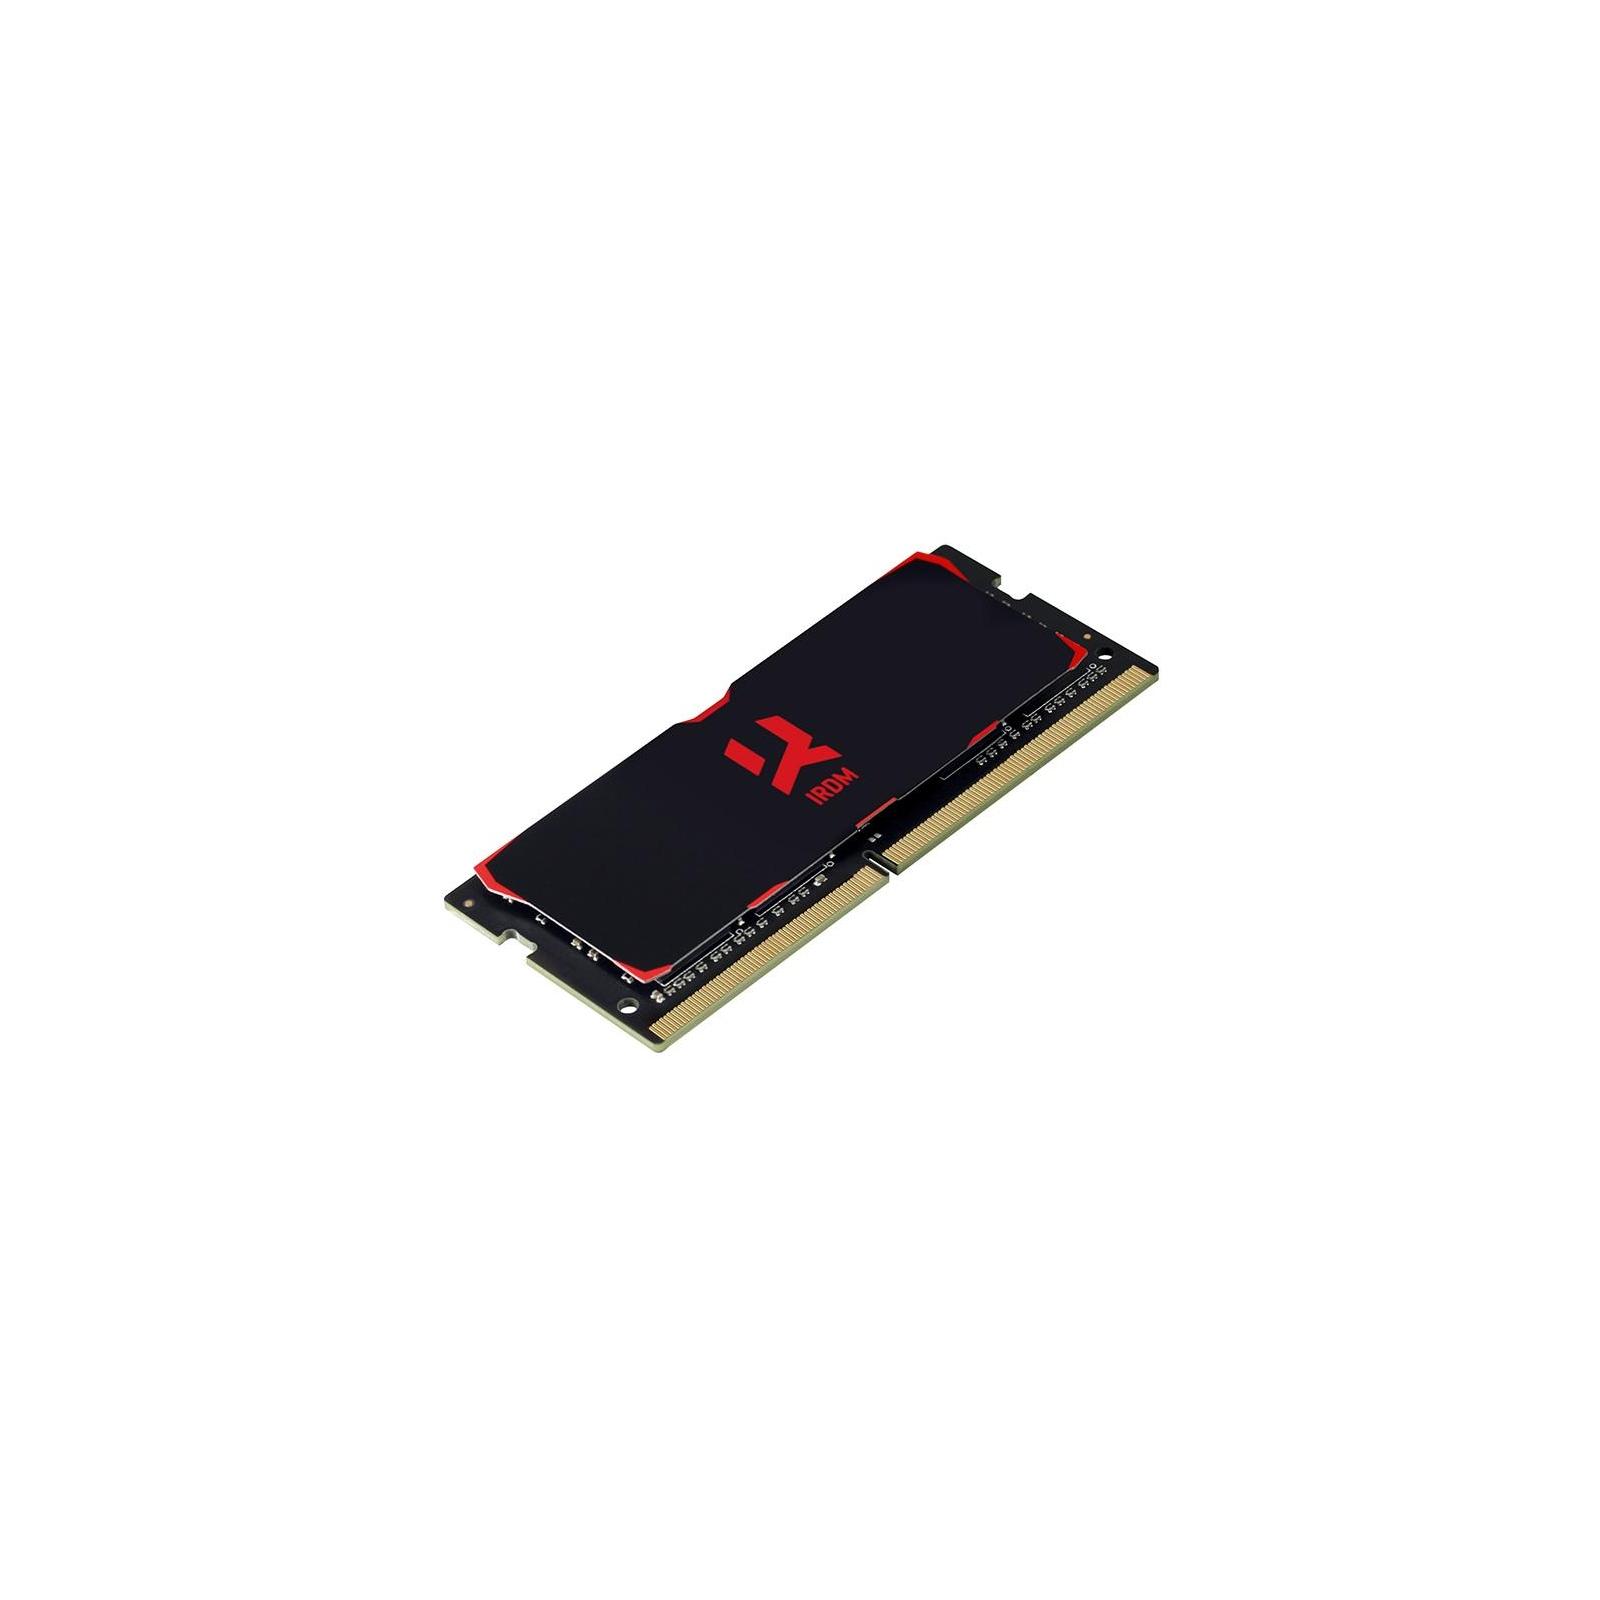 Модуль памяти для ноутбука SoDIMM DDR4 16GB 2133 MHz Iridium Goodram (IR-2133S464L14/16G) изображение 2